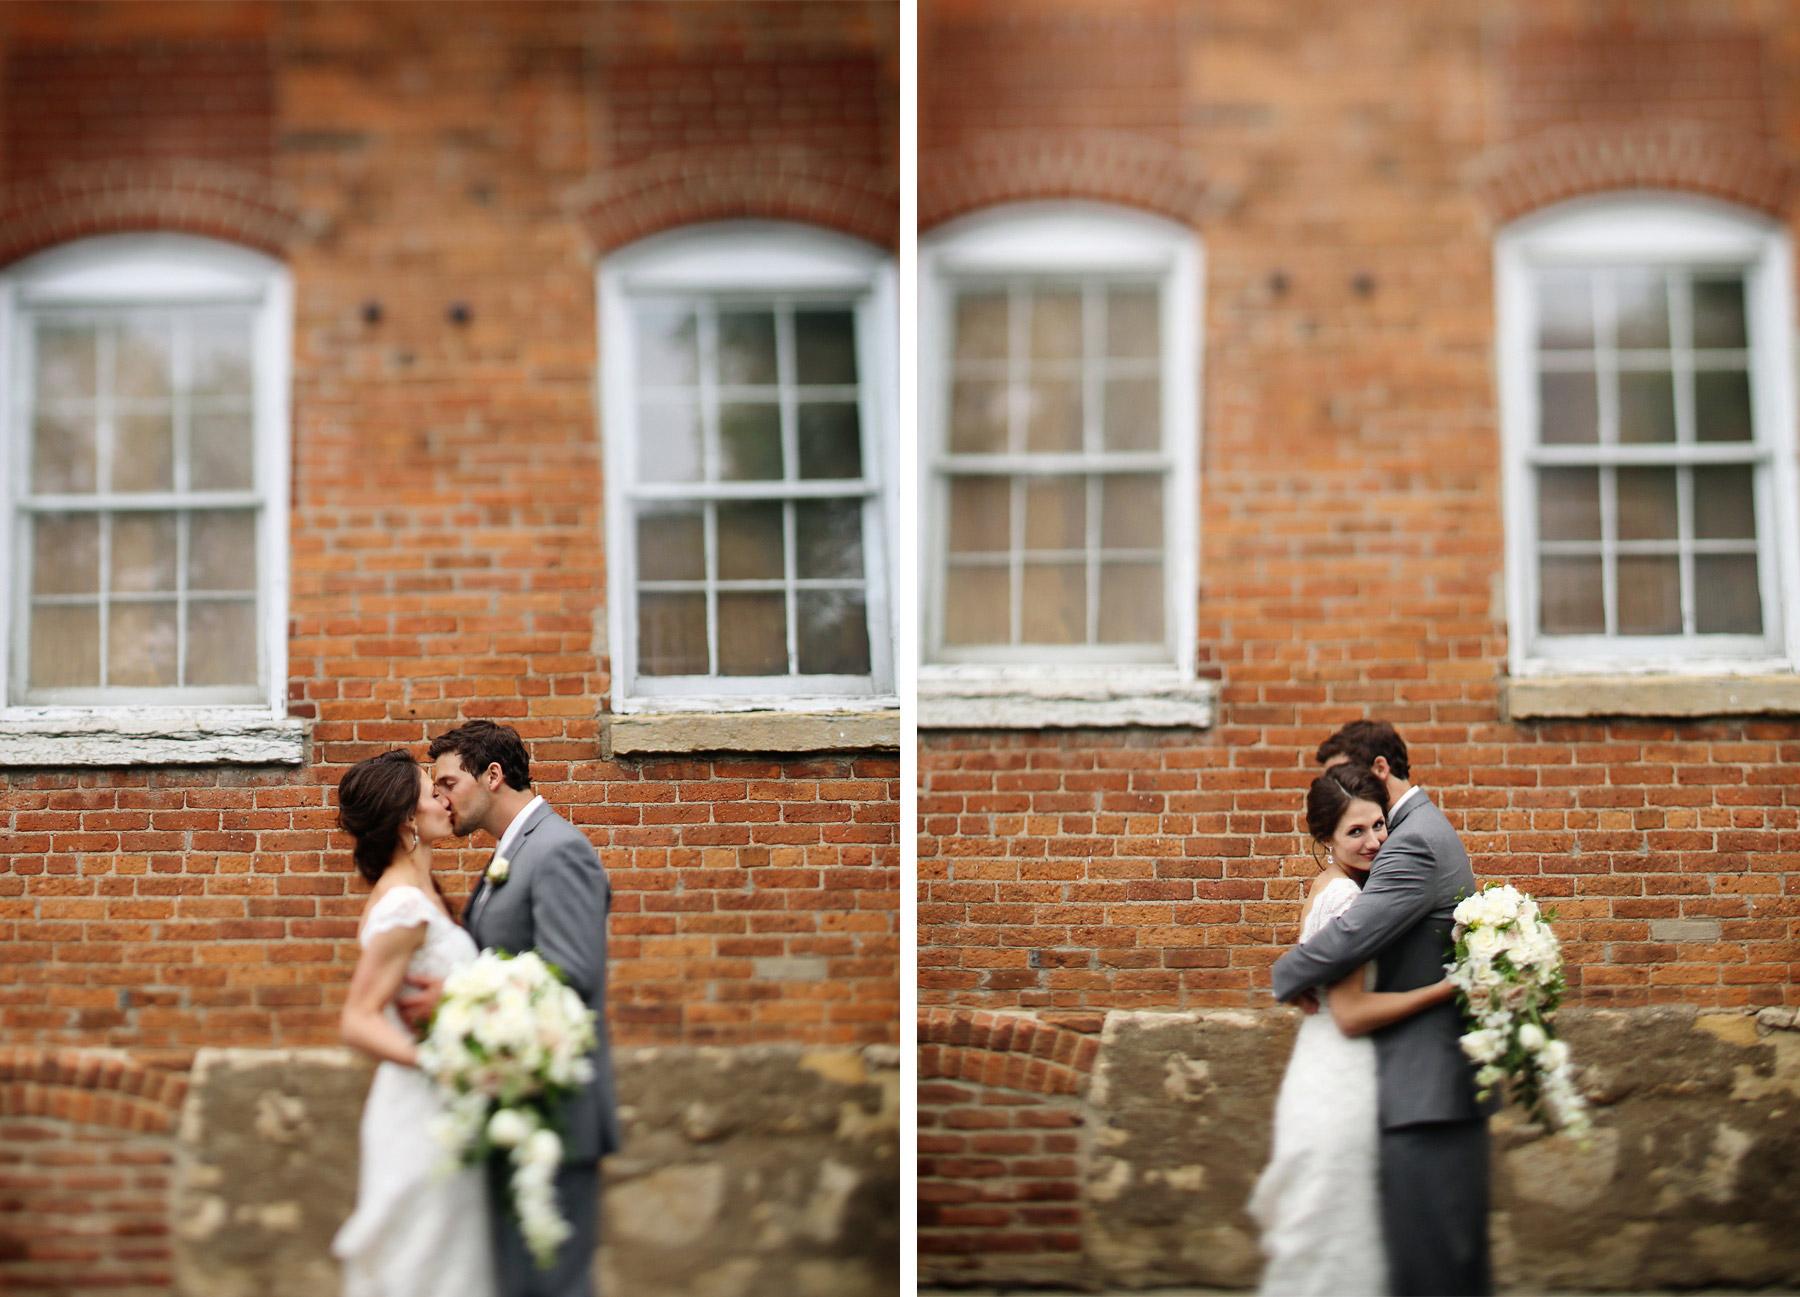 16-Stillwater-Minnesota-Wedding-Photography-by-Vick-Photography--Vintage-Alicia-&-Cole.jpg